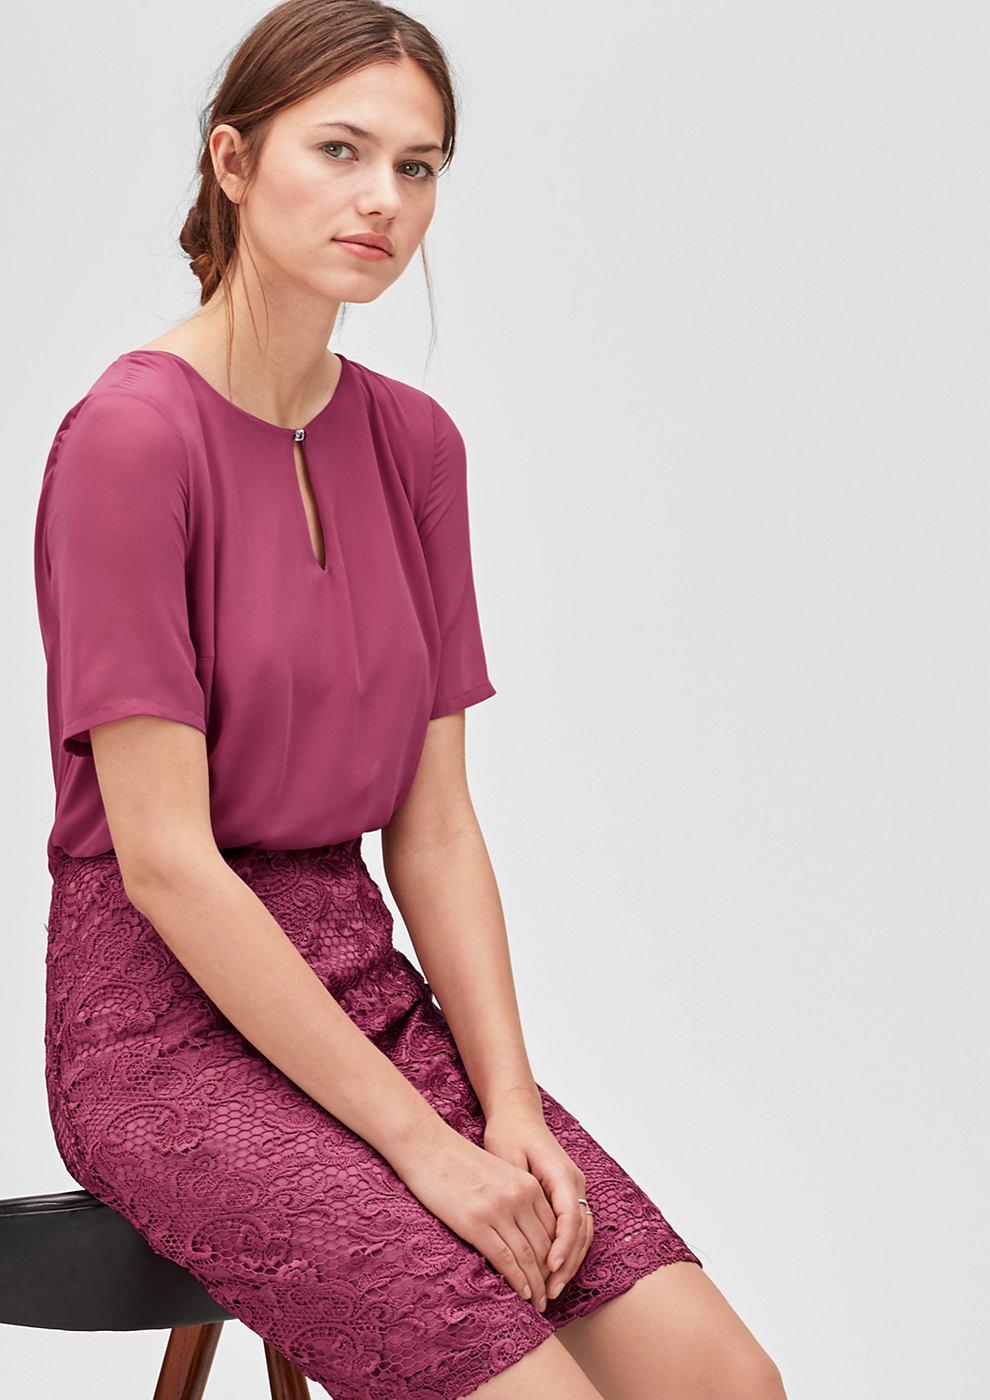 s.Oliver Premium 2-in-1 jurk van chiffon en kant roze